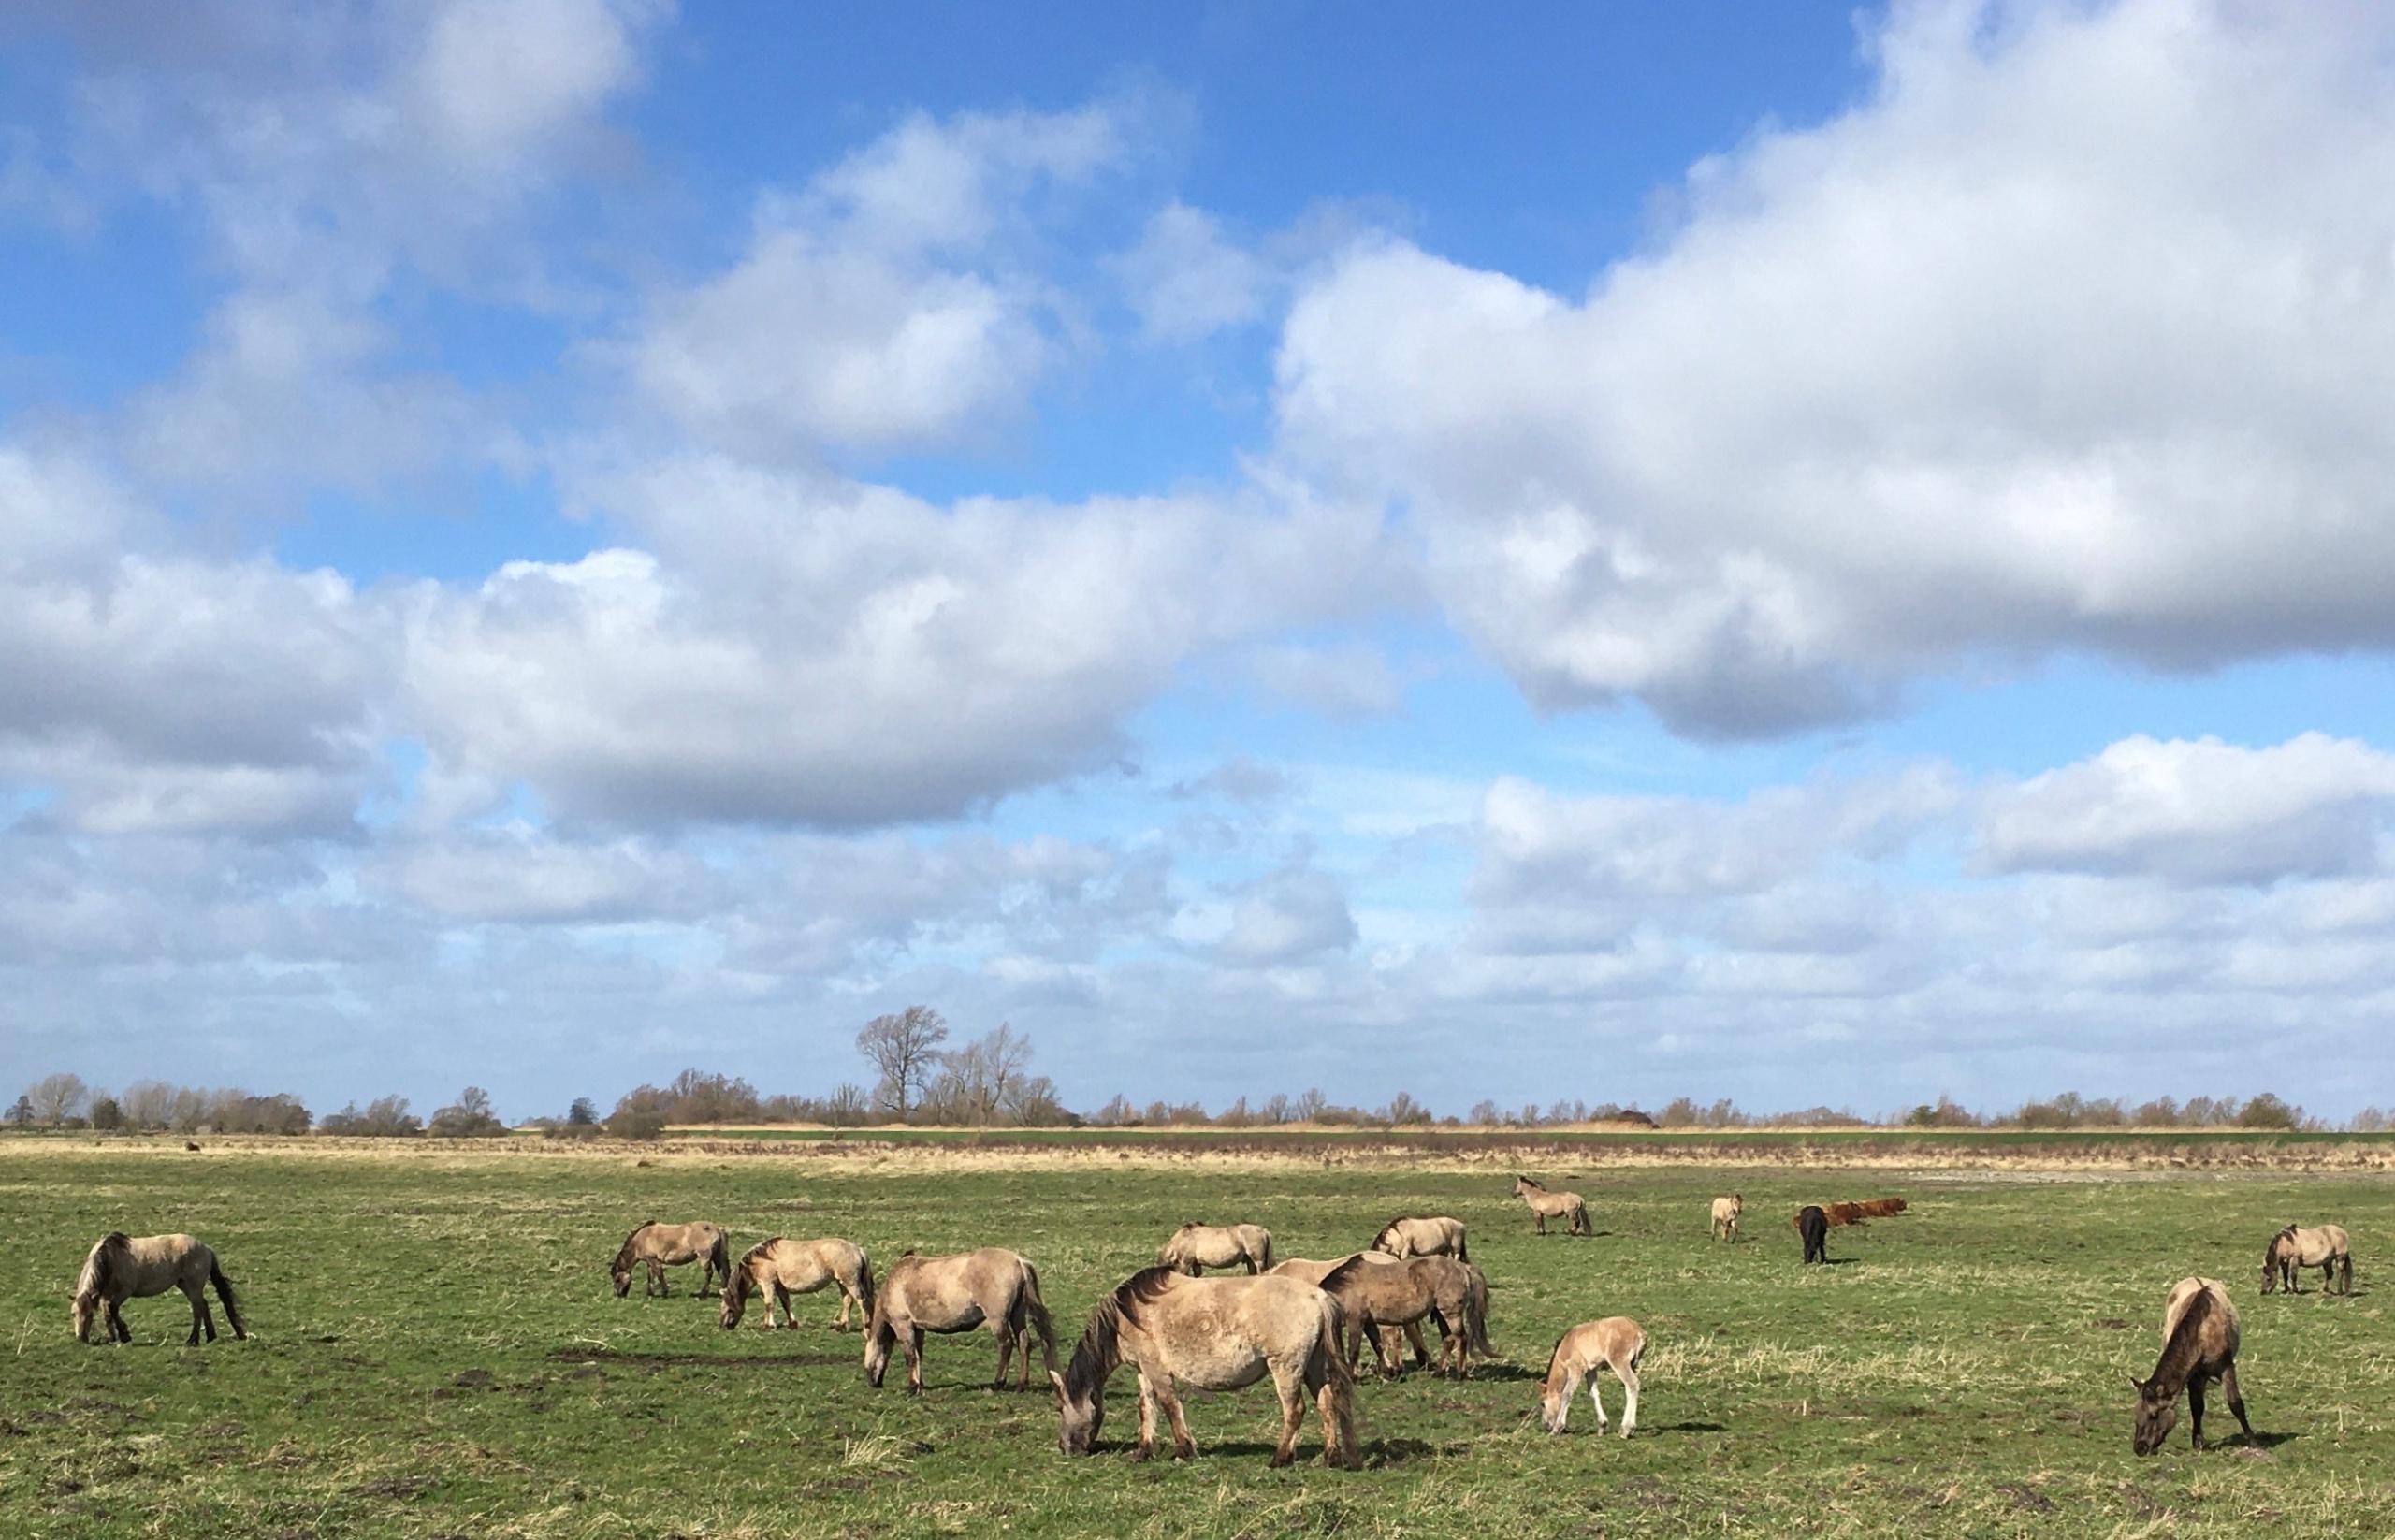 Charles | Moseley | Coronavirus | Spring | Blog | Covid19 | Lockdown | Cambridge | Writer | Konik | horses